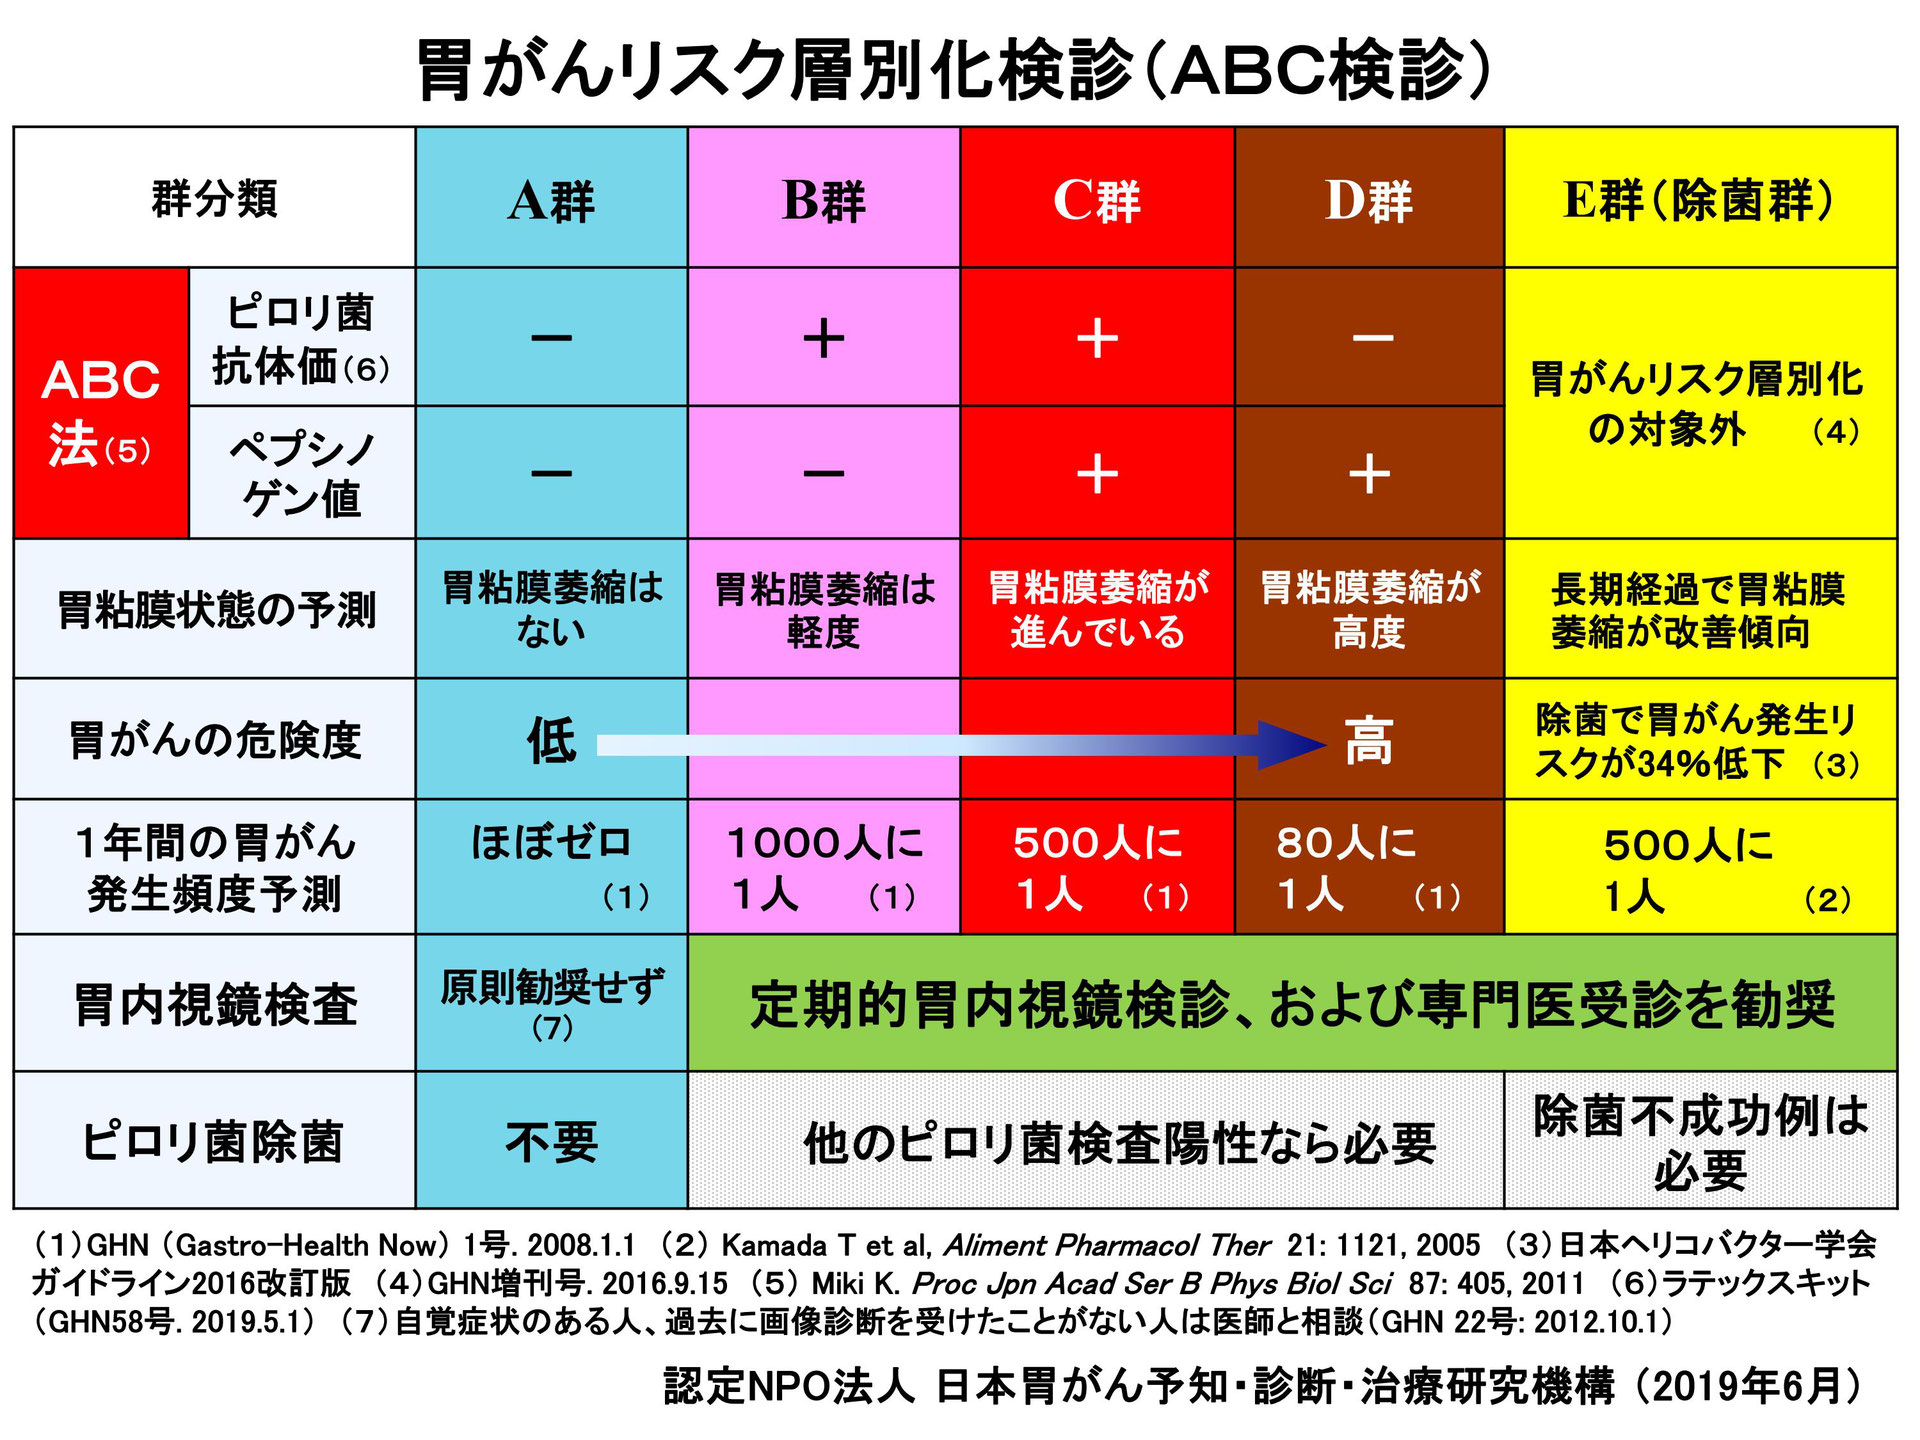 B 型 肝炎 ワクチン 値段